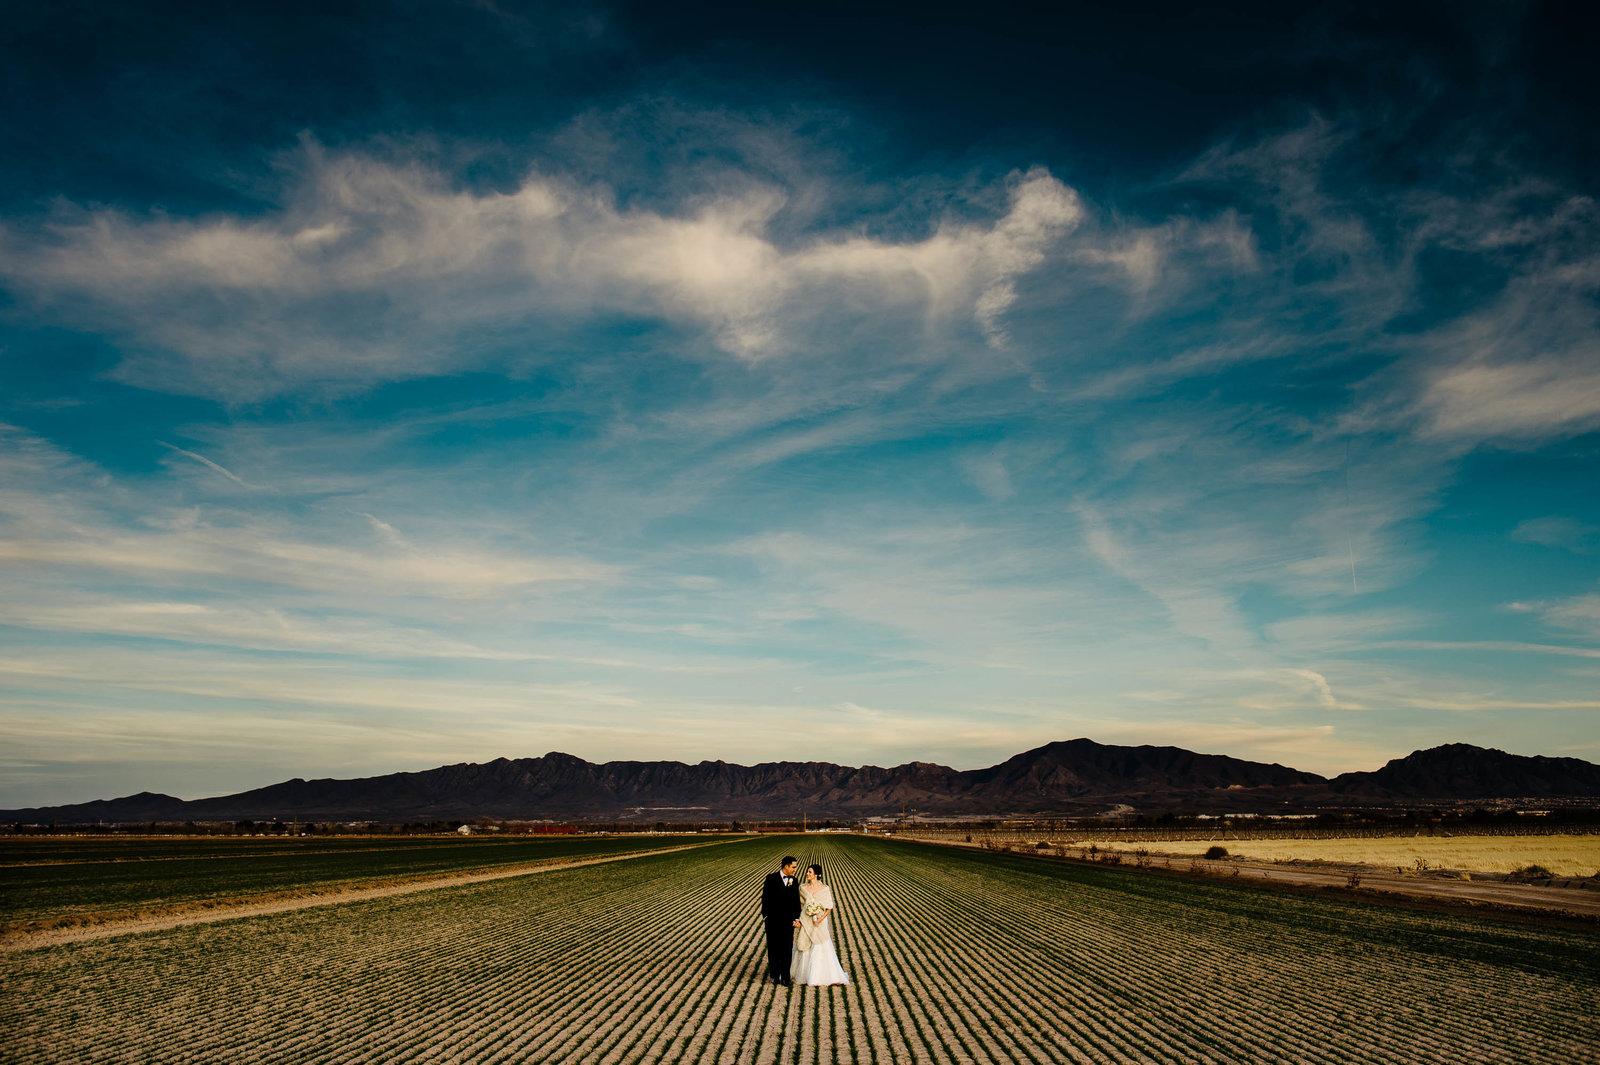 253-El-paso-wedding-photographer-Naje_0585